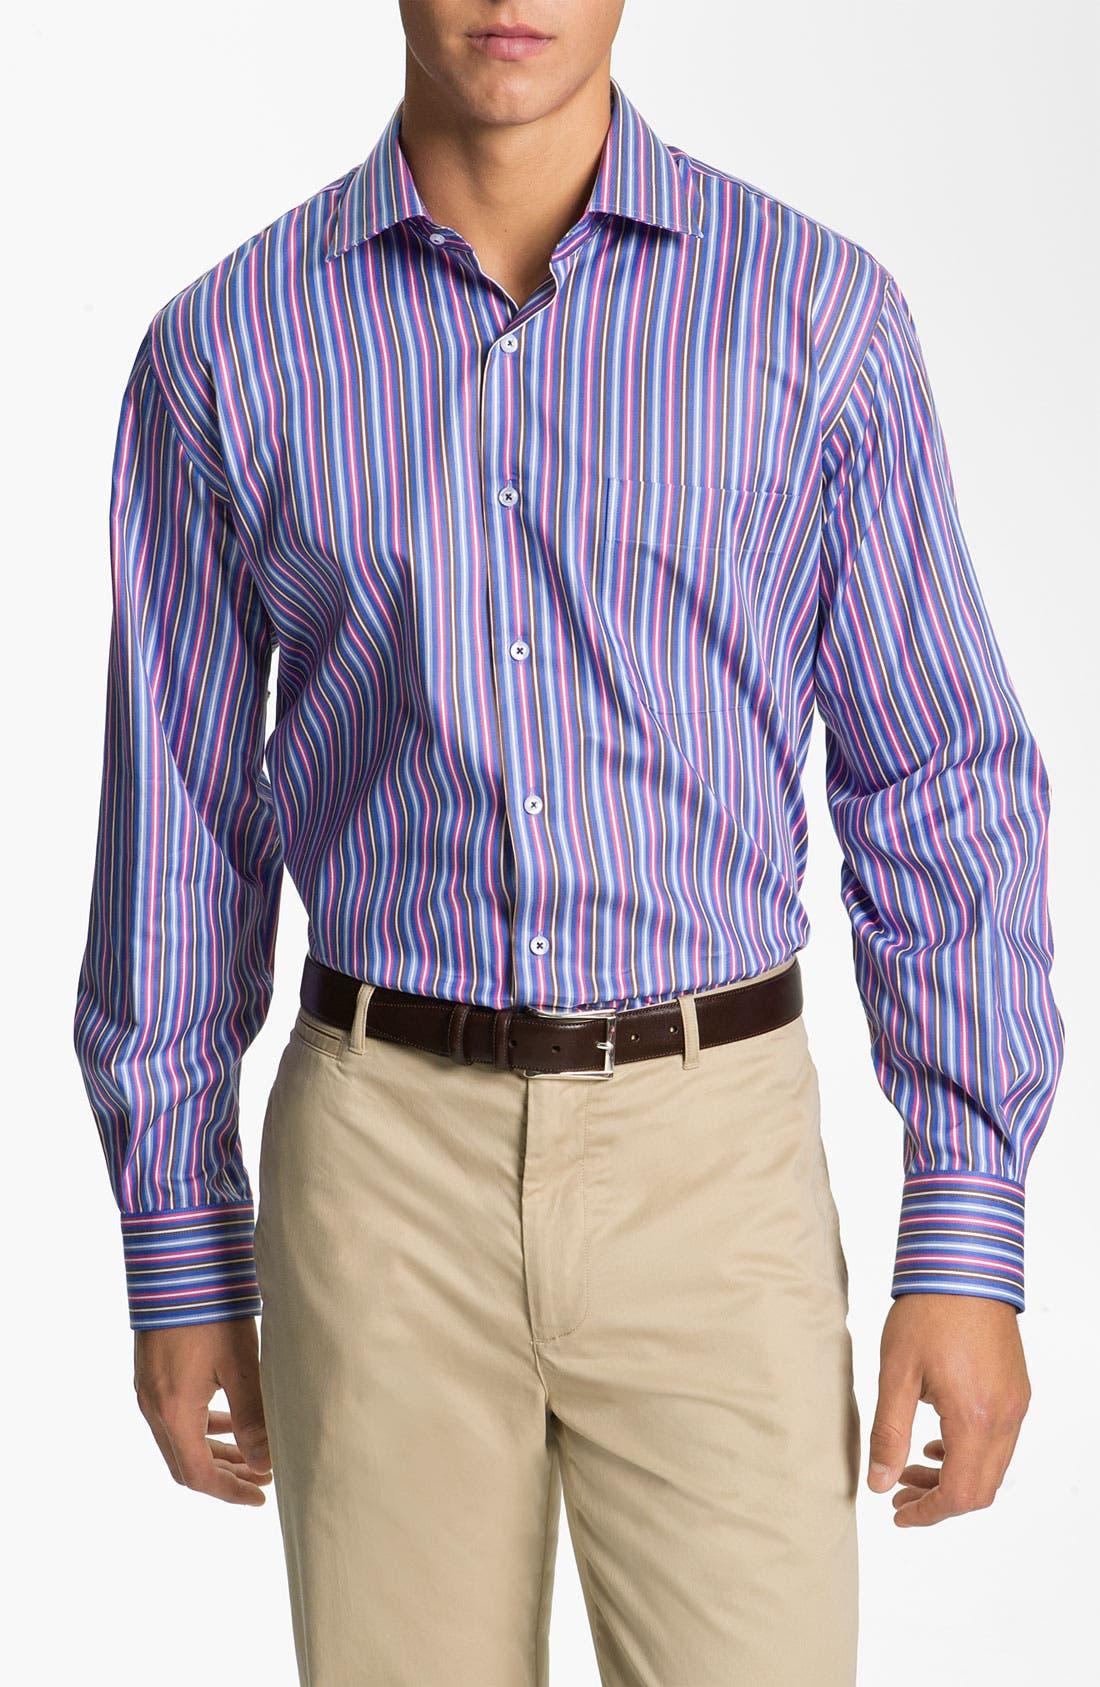 Alternate Image 1 Selected - Peter Millar 'Pop Stripe' Sport Shirt